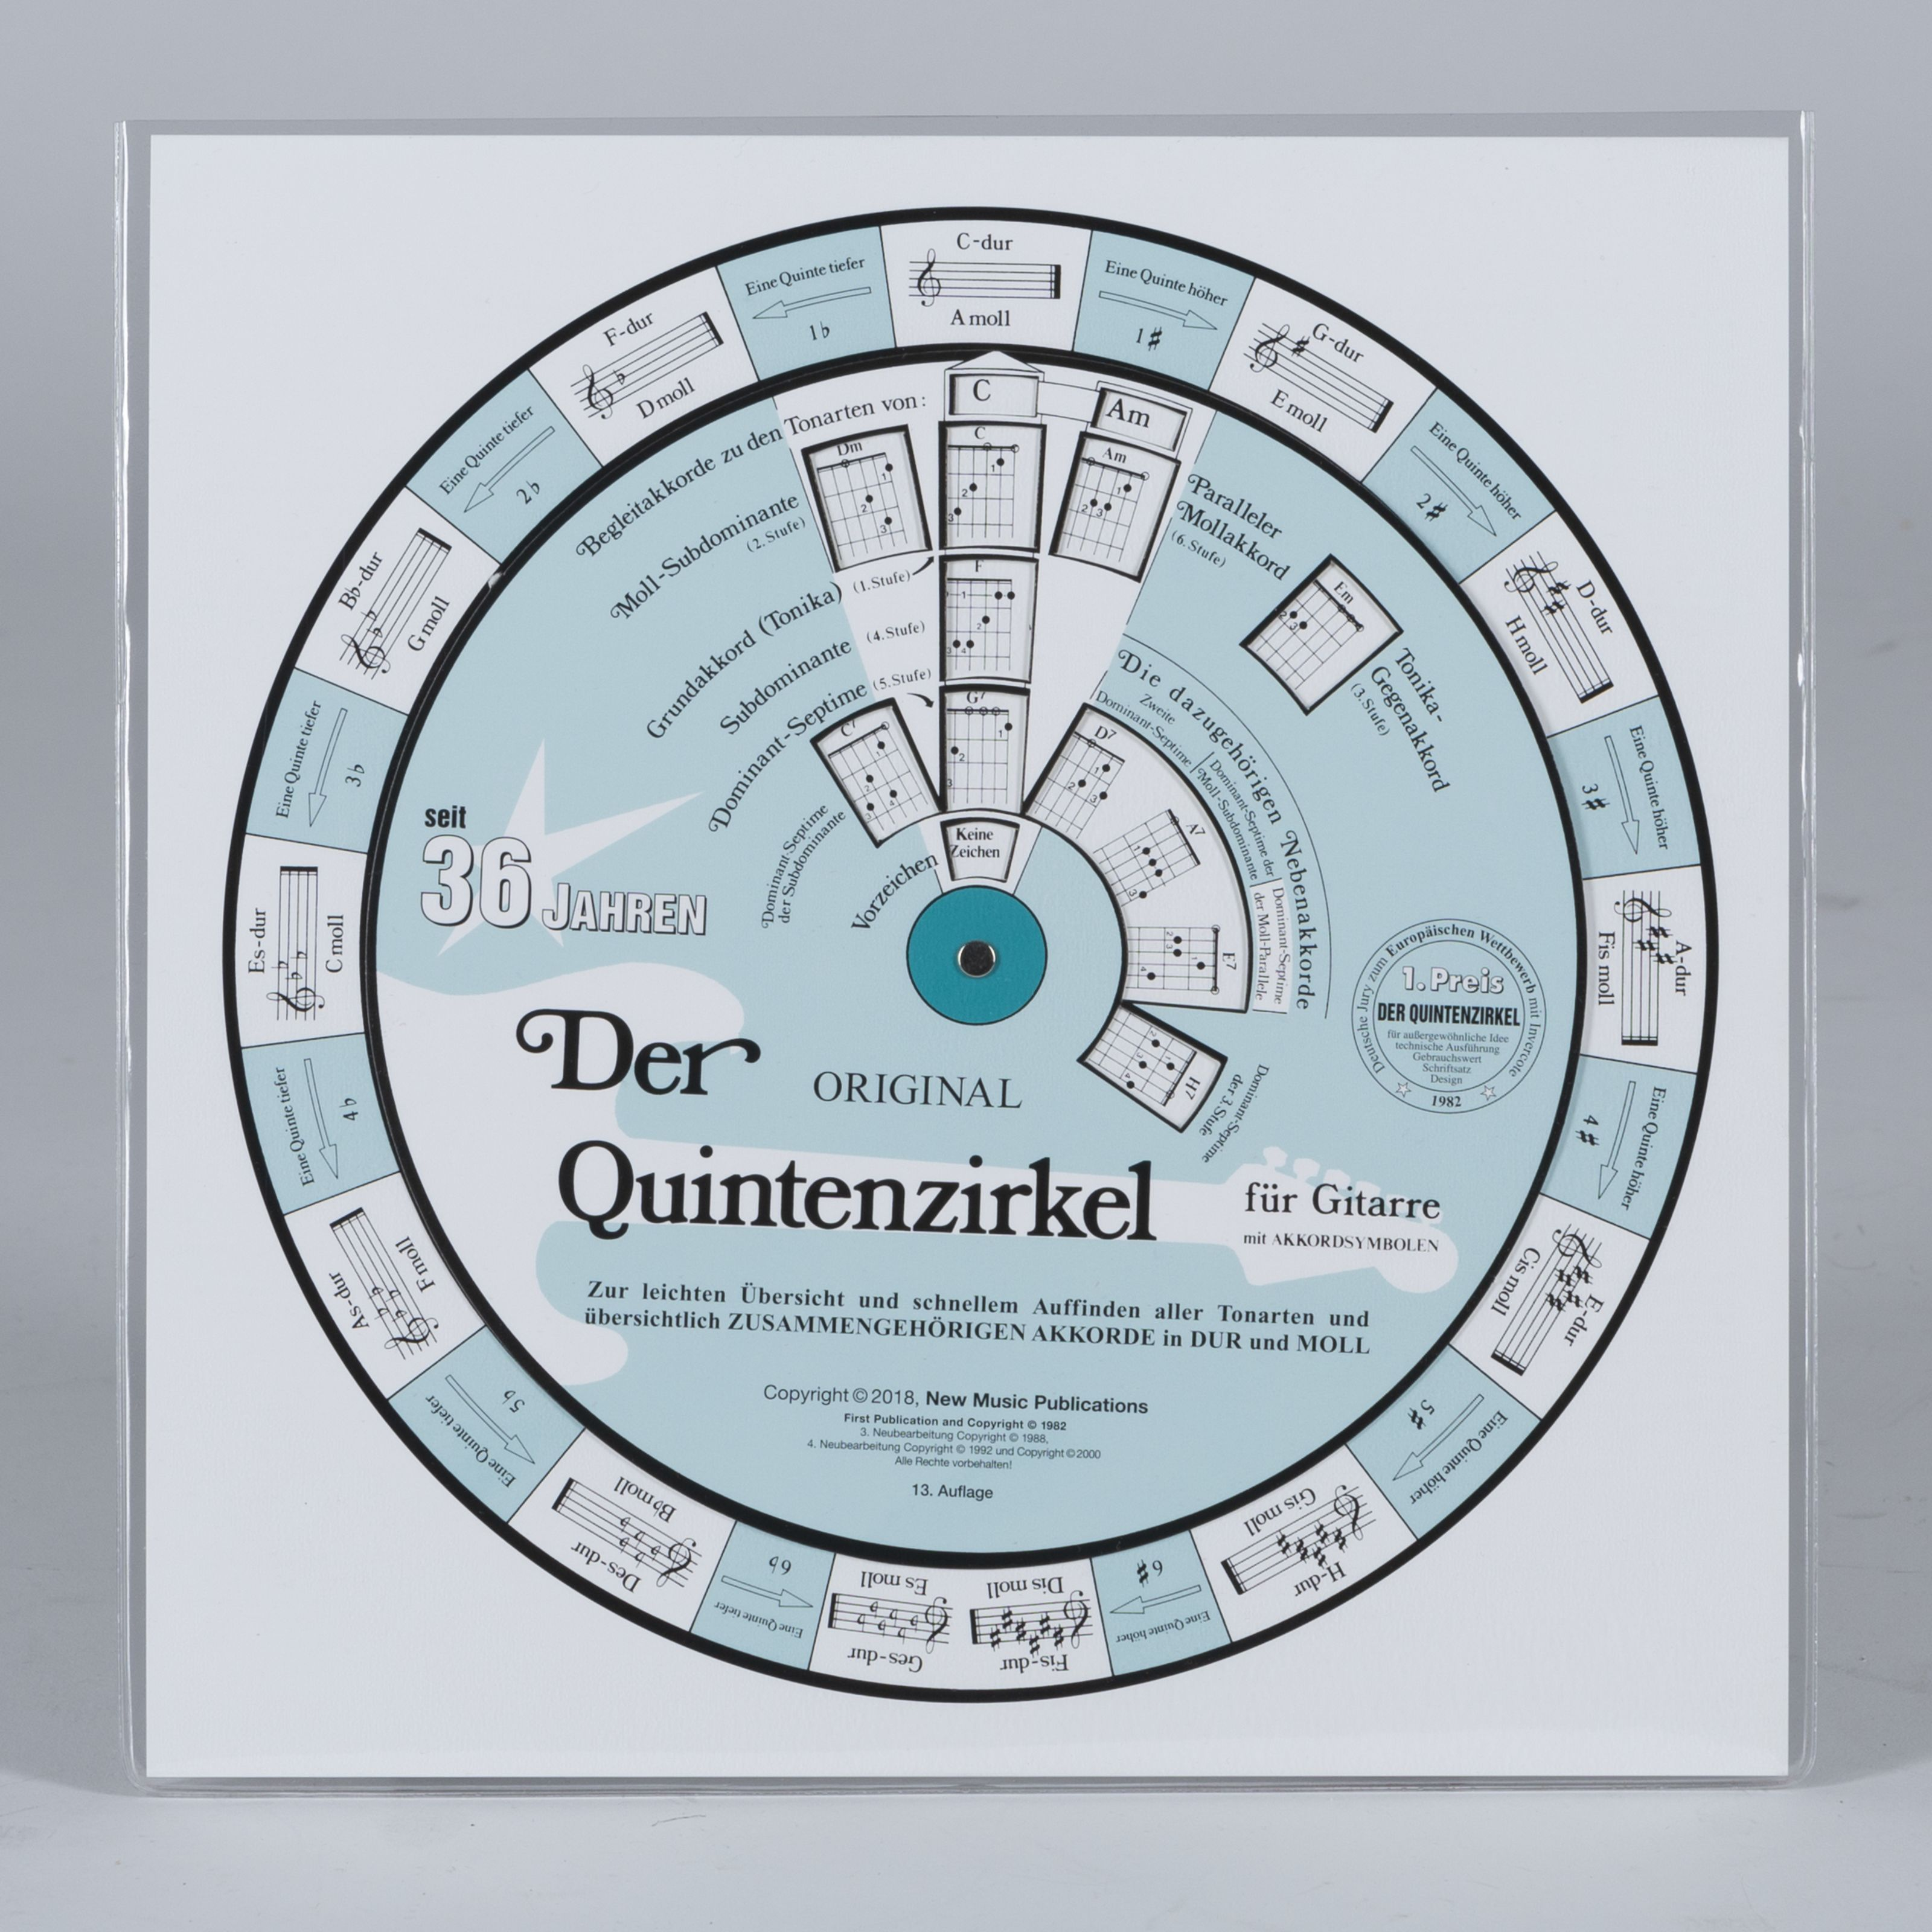 New Music Publications - Quintenzirkel für Gitarre NMP 0002